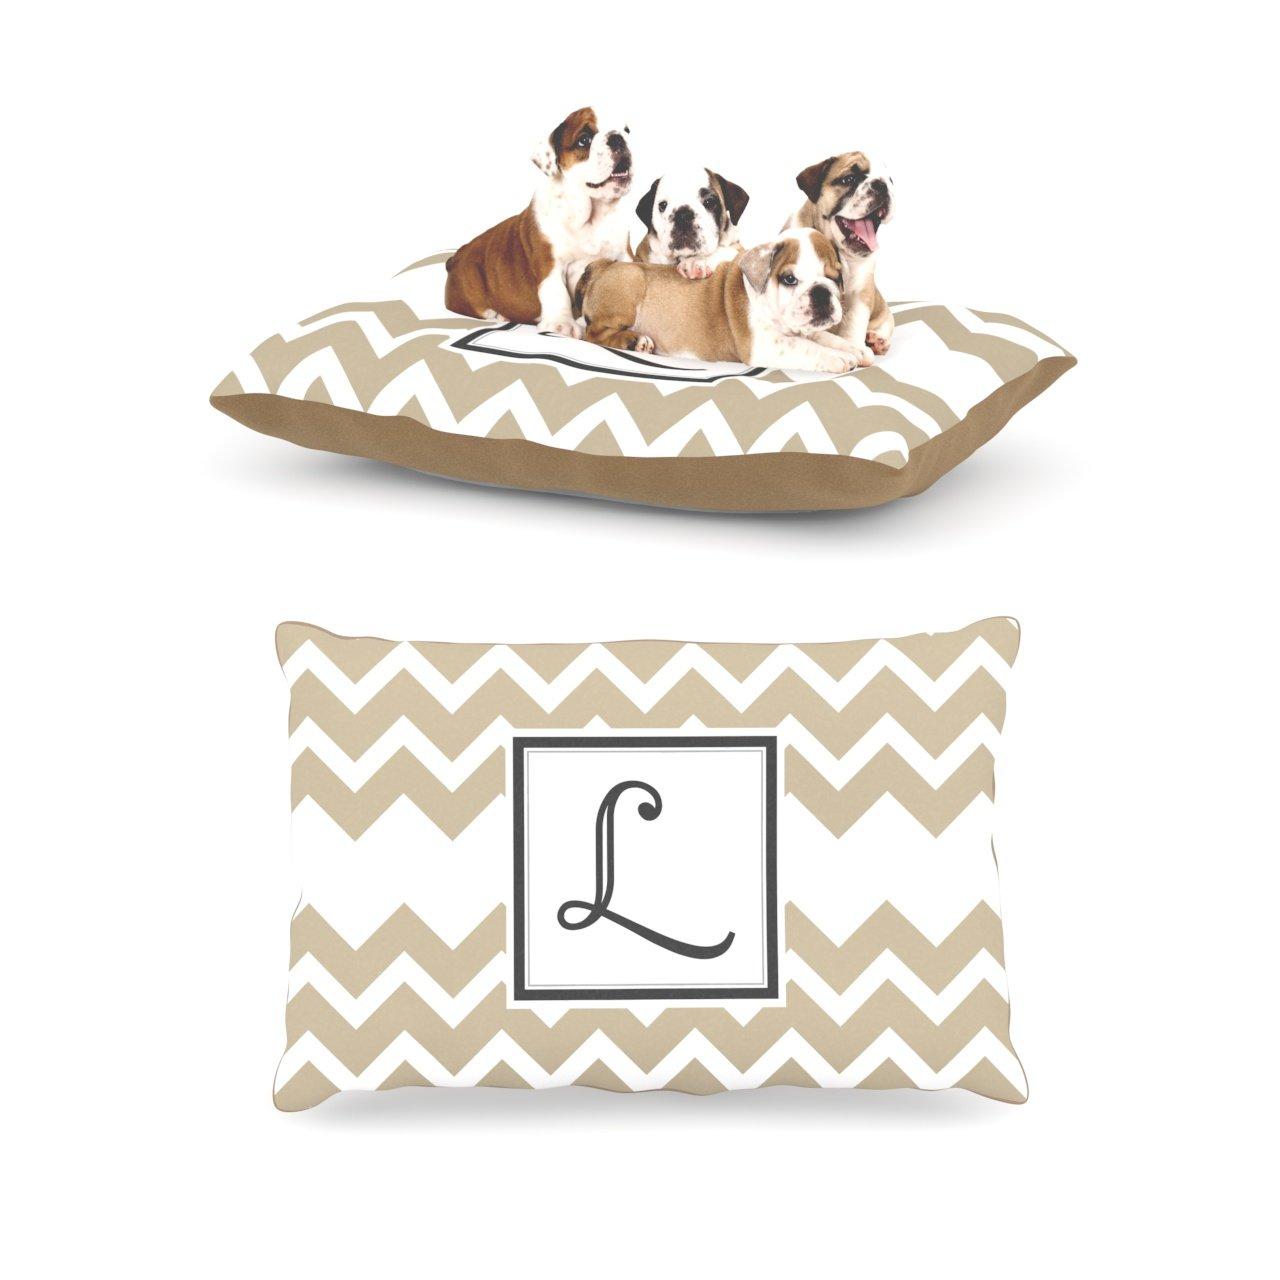 L Large 30  x 40 Kess InHouse Chevron Tan Fleece Dog Bed, 30 by 40Inch, Monogram LetterH